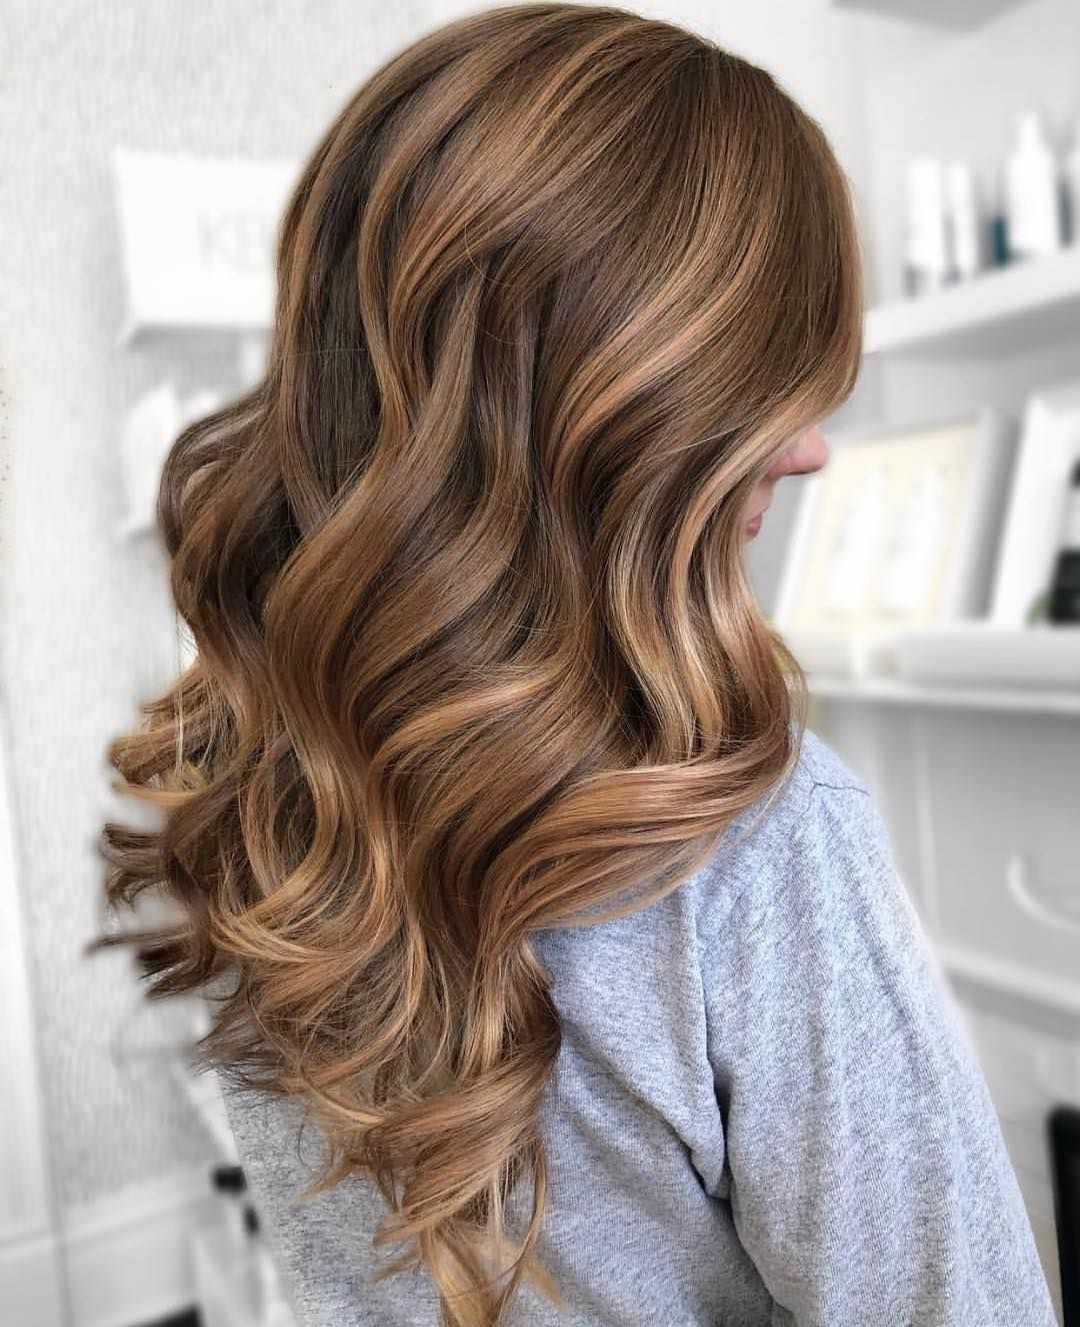 Quick Tutorial Swift Wavy Hair In 2020 Greasy Hair Hairstyles Natural Wavy Hair Oily Hair